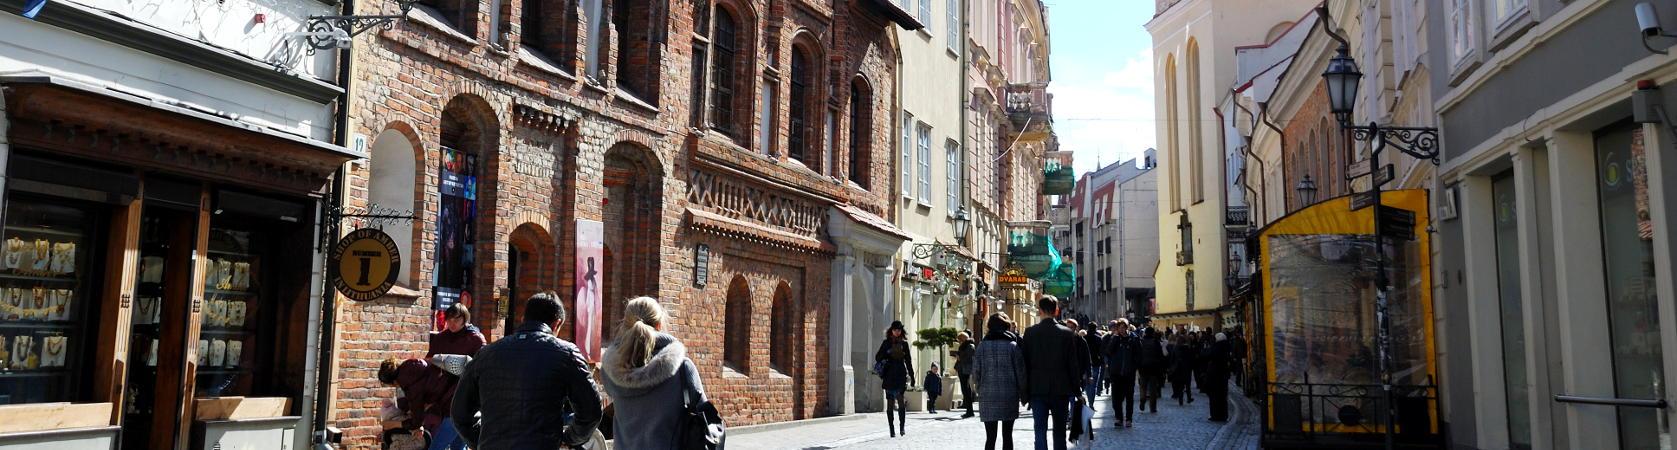 Vilniaus Pilies gatve